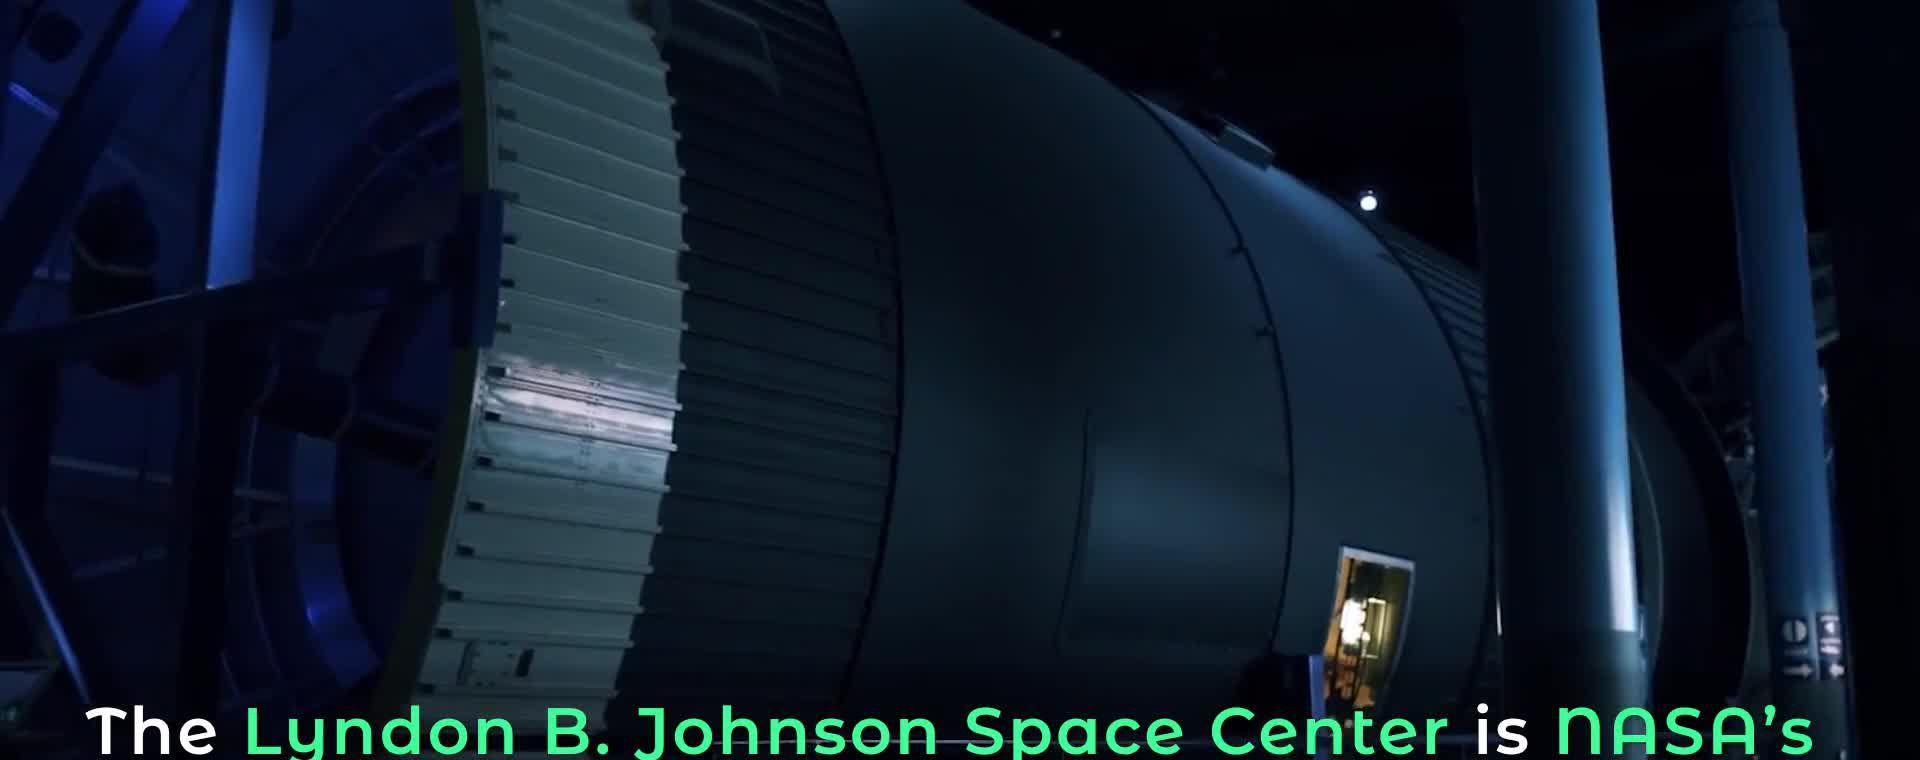 JOHNSON SPACE CENTER INSTAGRAM